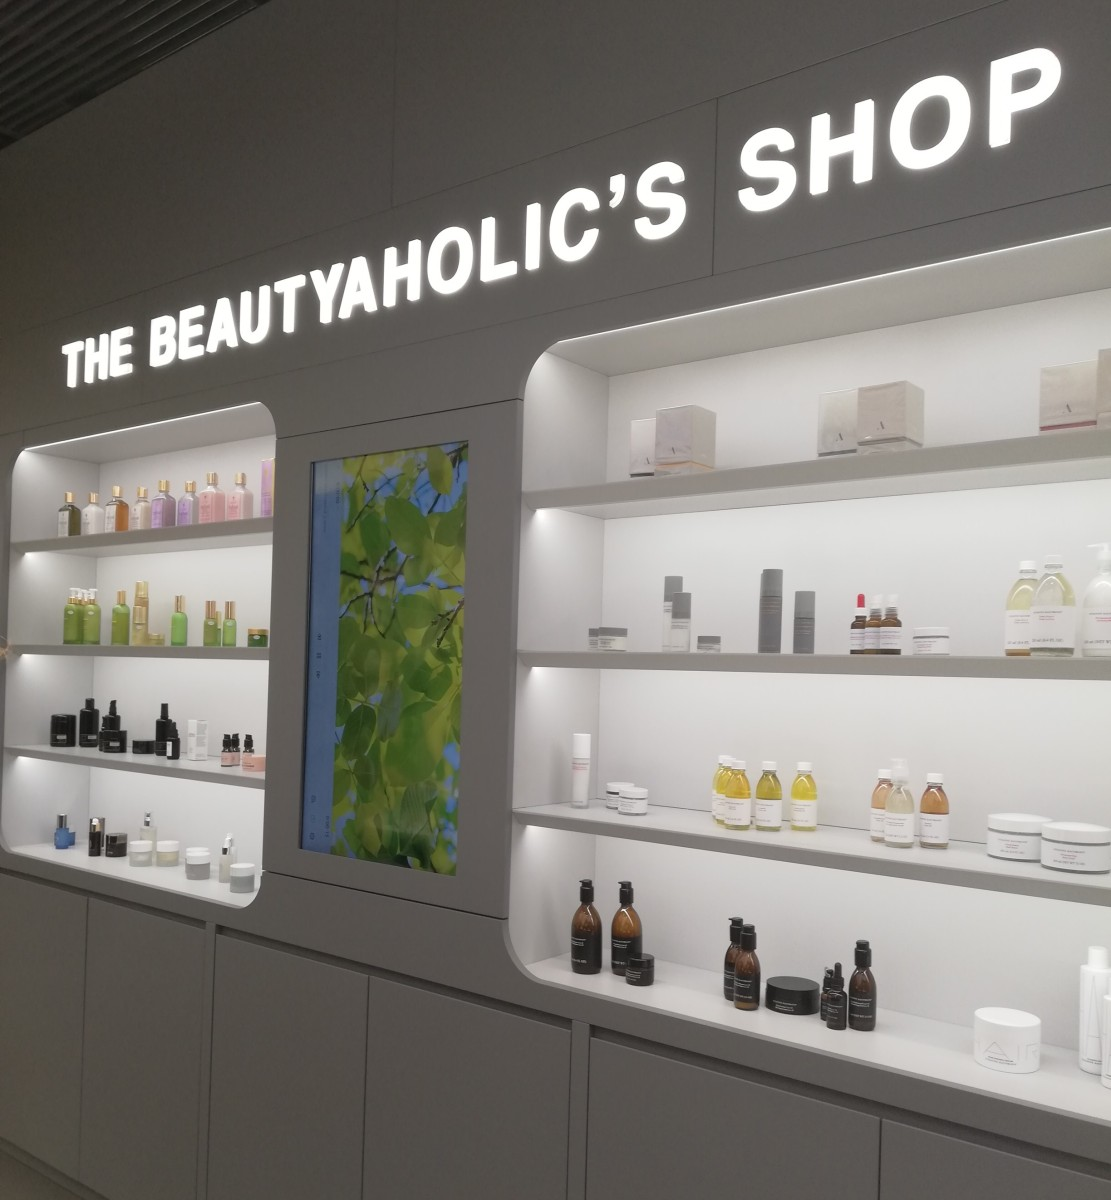 Arriva a Milano la cosmesi naturale di The Beautyaholic's Shop